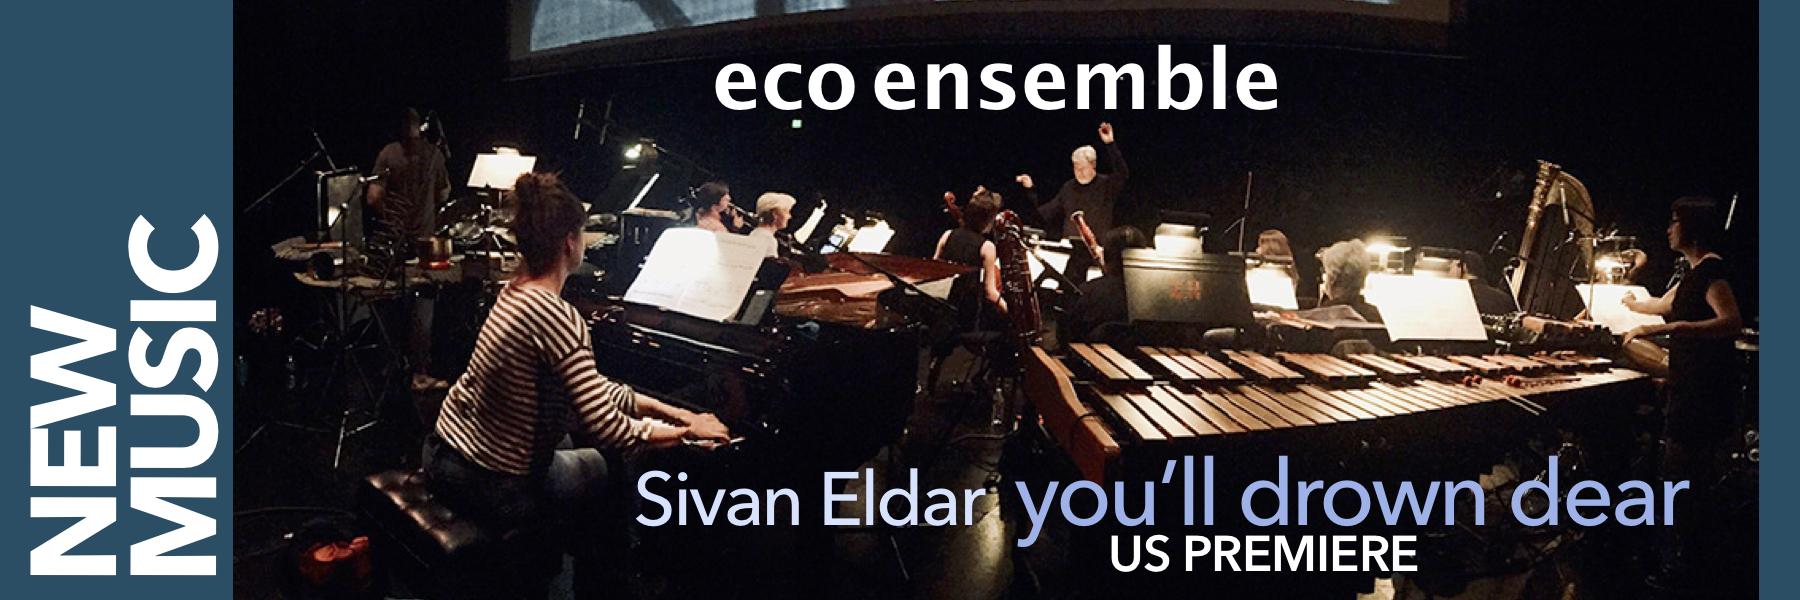 2019 Eco Ensemble.jpg